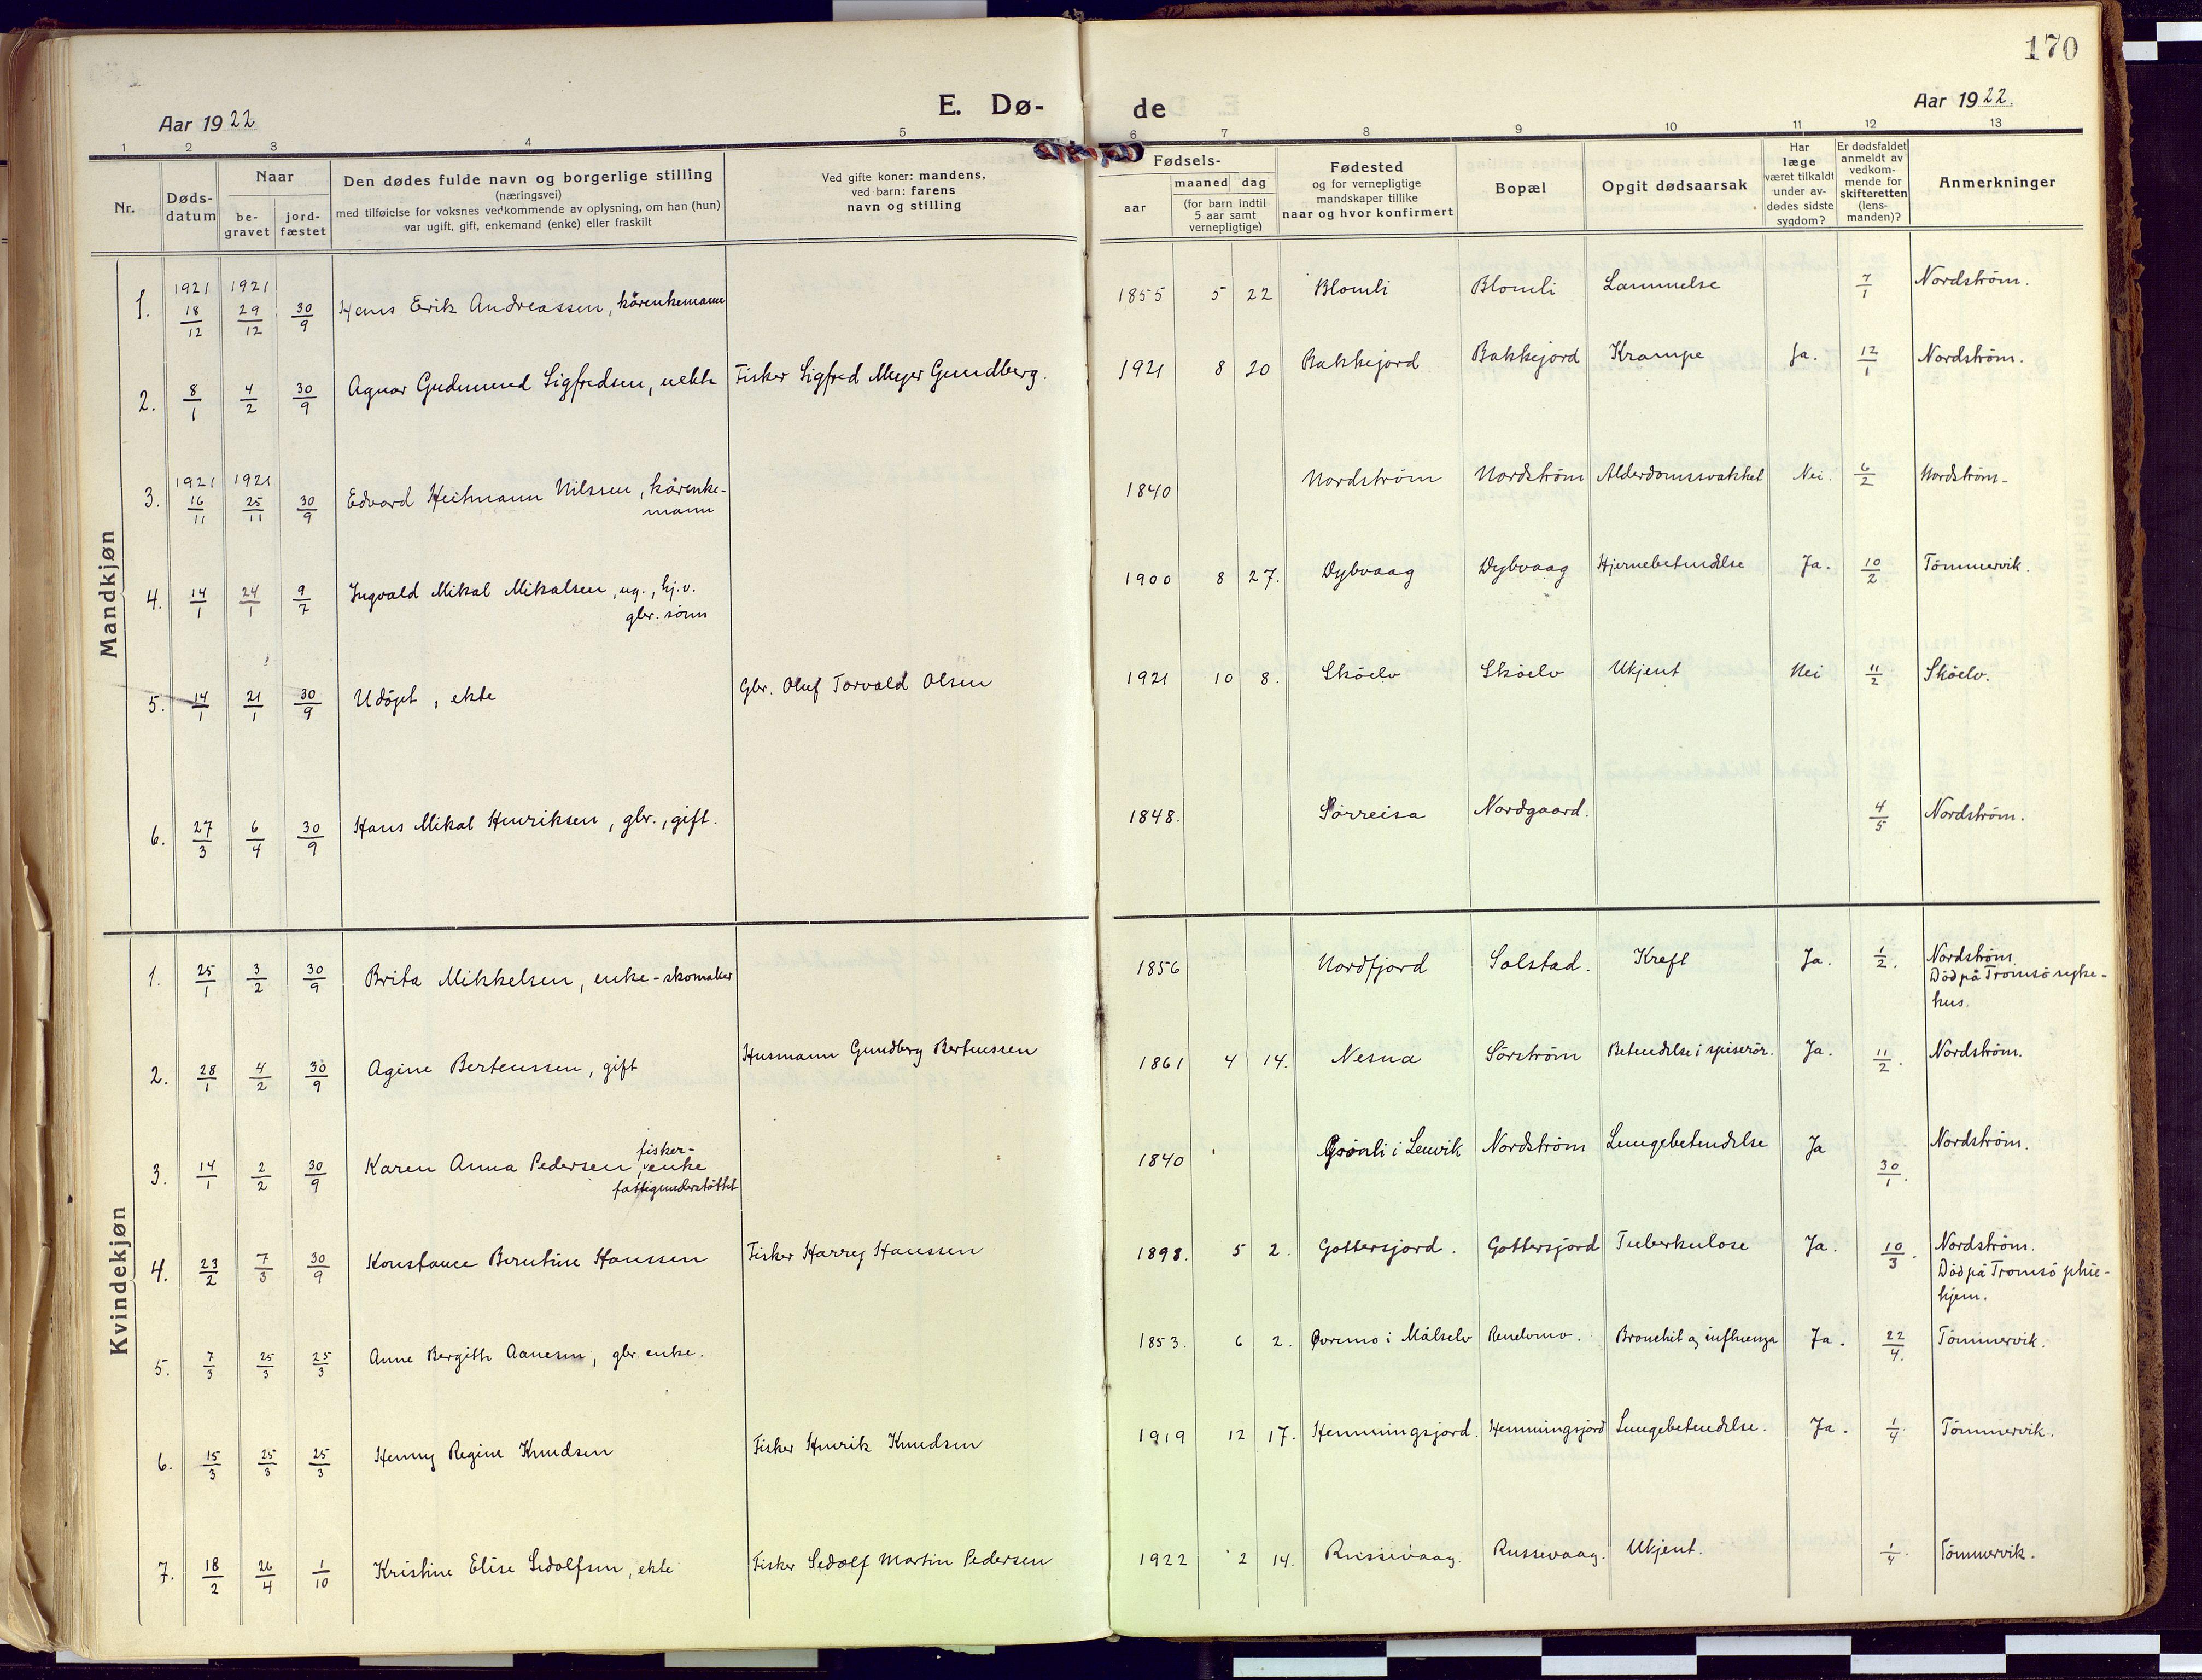 SATØ, Tranøy sokneprestkontor, I/Ia/Iaa/L0015kirke: Ministerialbok nr. 15, 1919-1928, s. 170